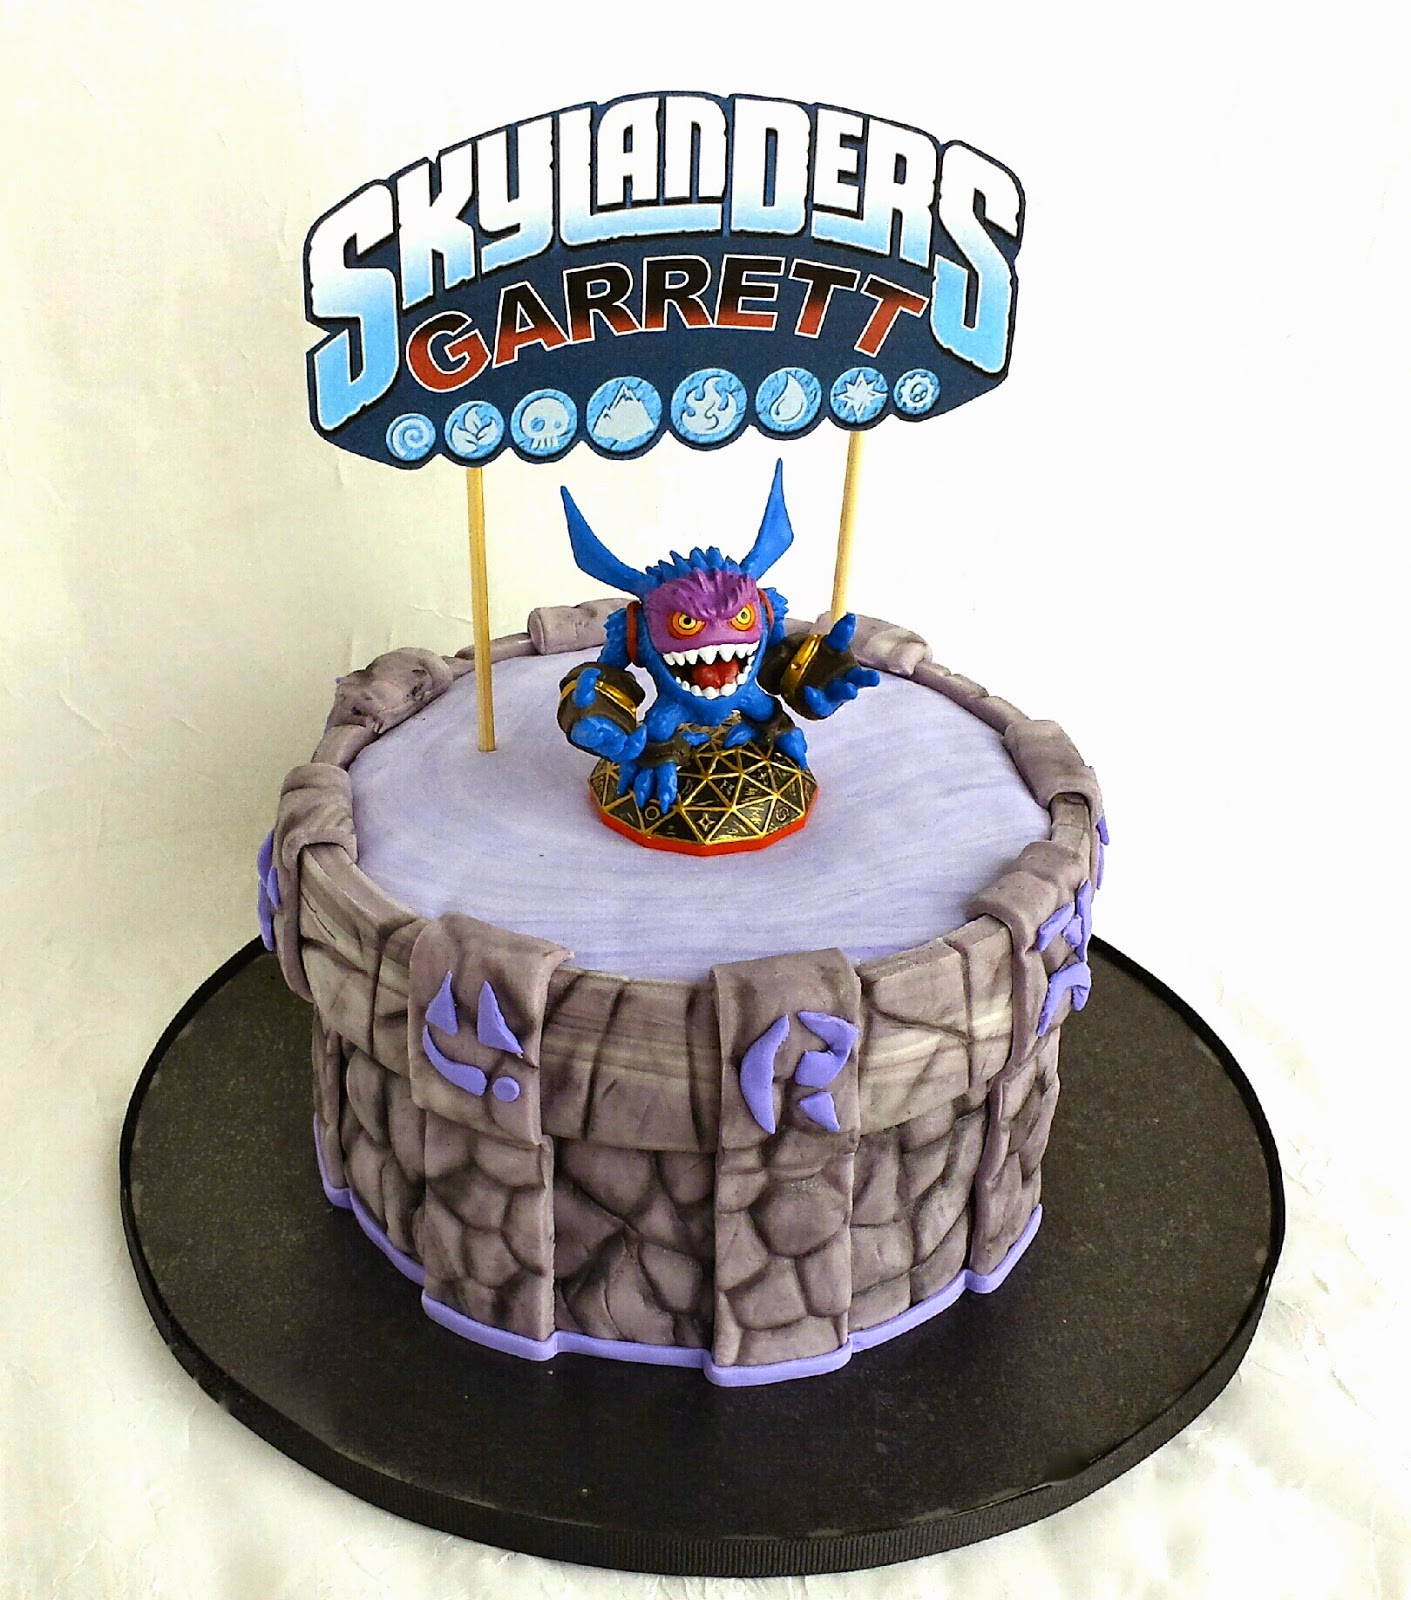 Skylander Cake Topper Tutorial